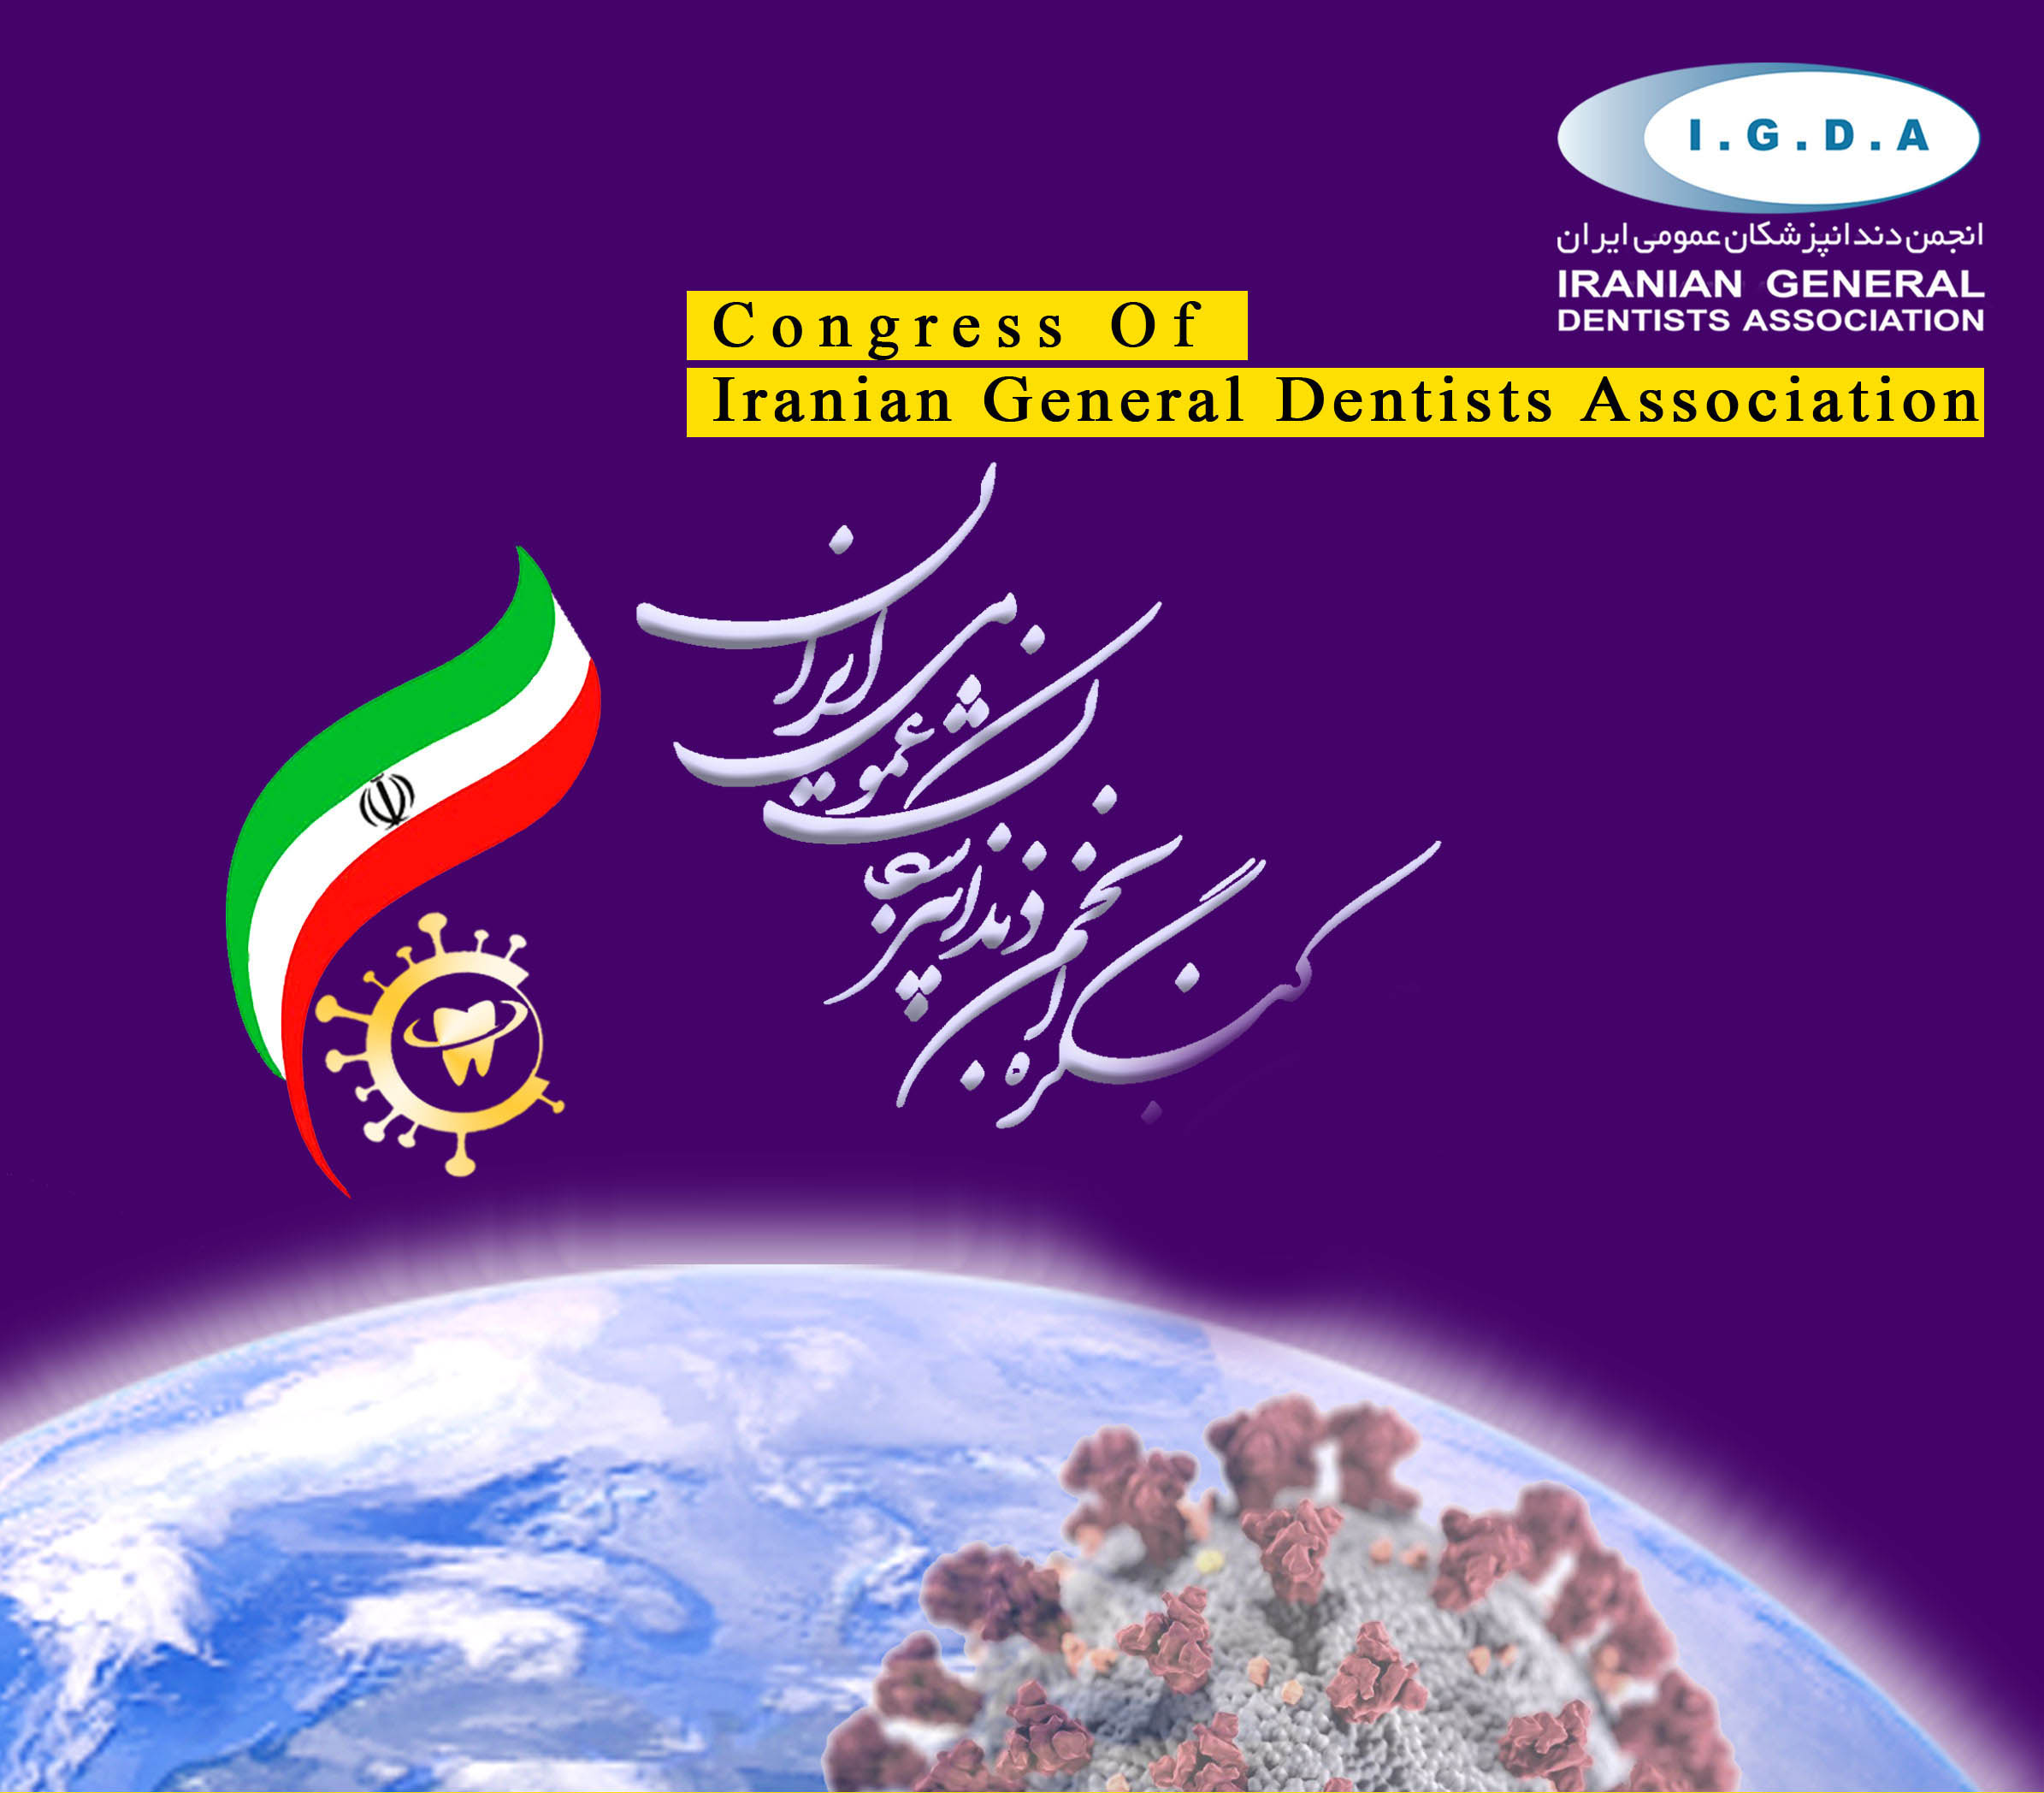 Iranian Dental Congress